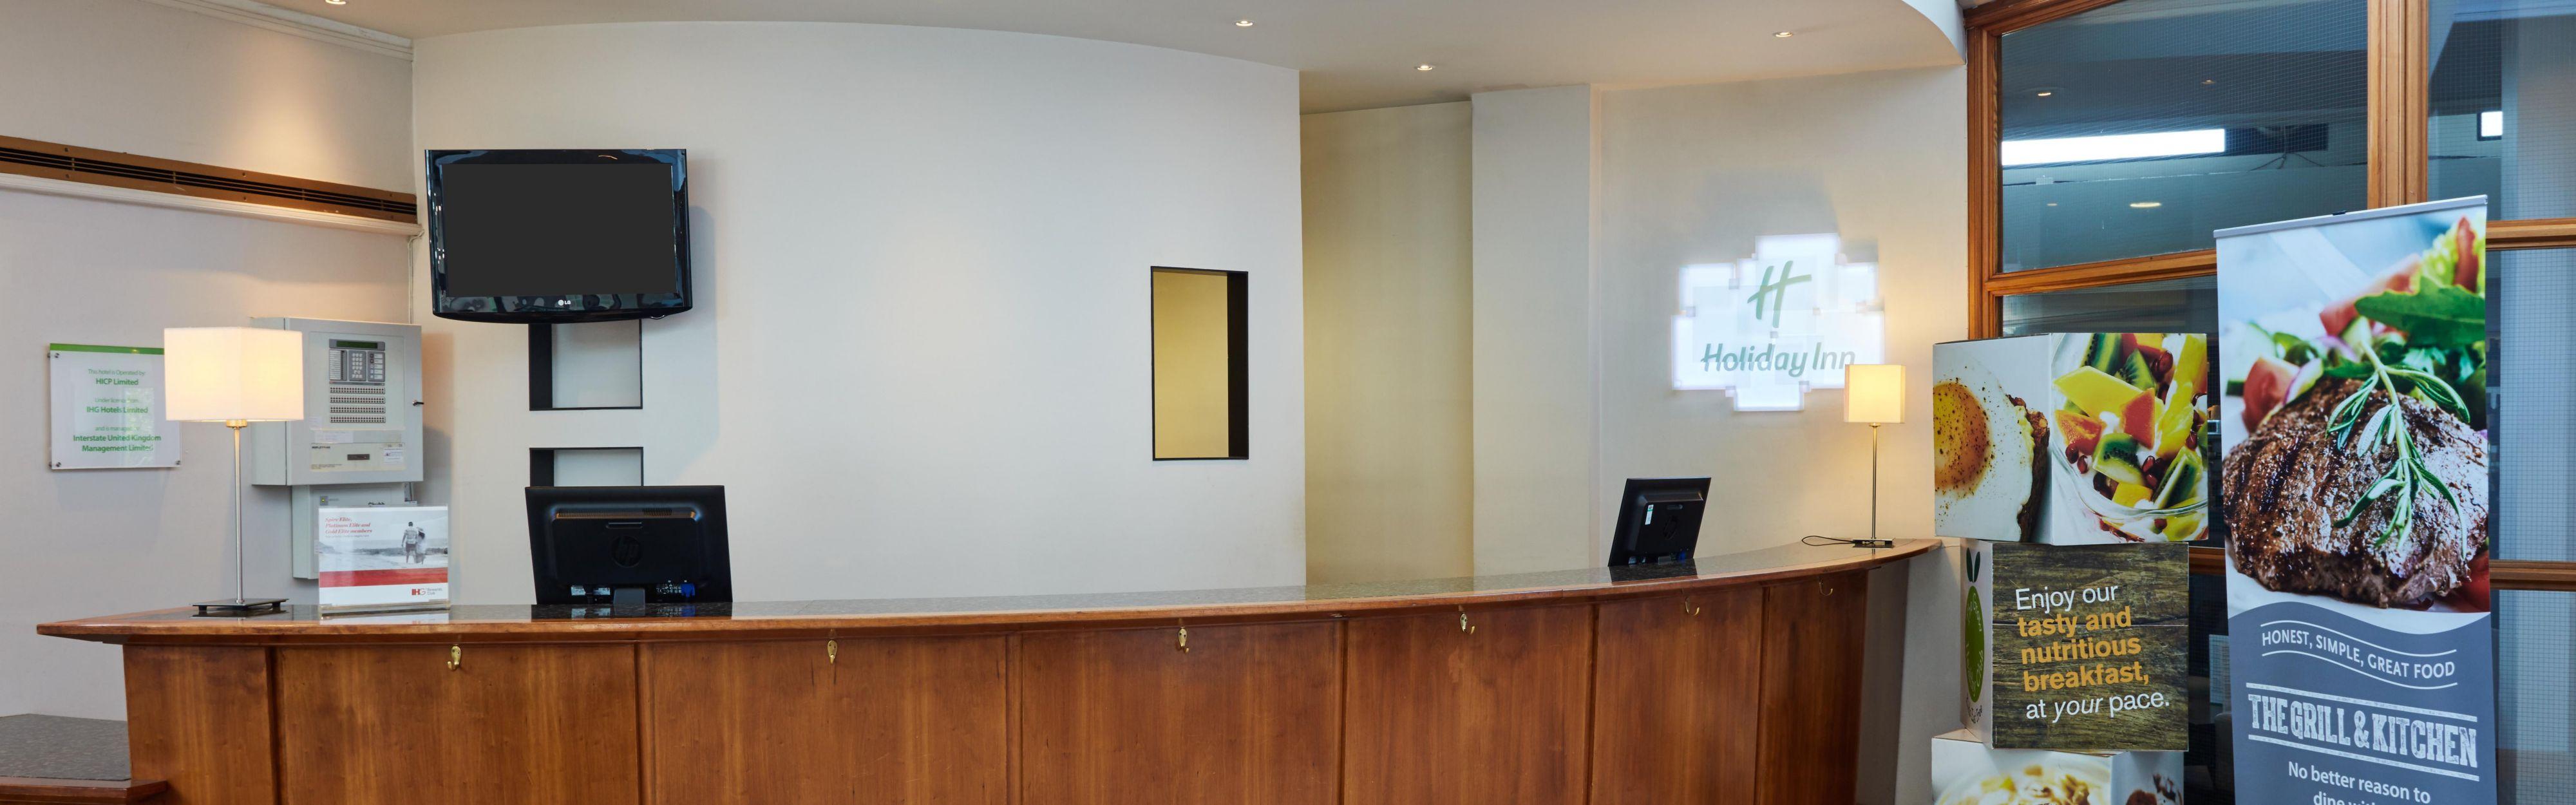 Free A Very Welcoming Reception Team Awaits Hotel With Hotels Near Waverley Station Edinburgh